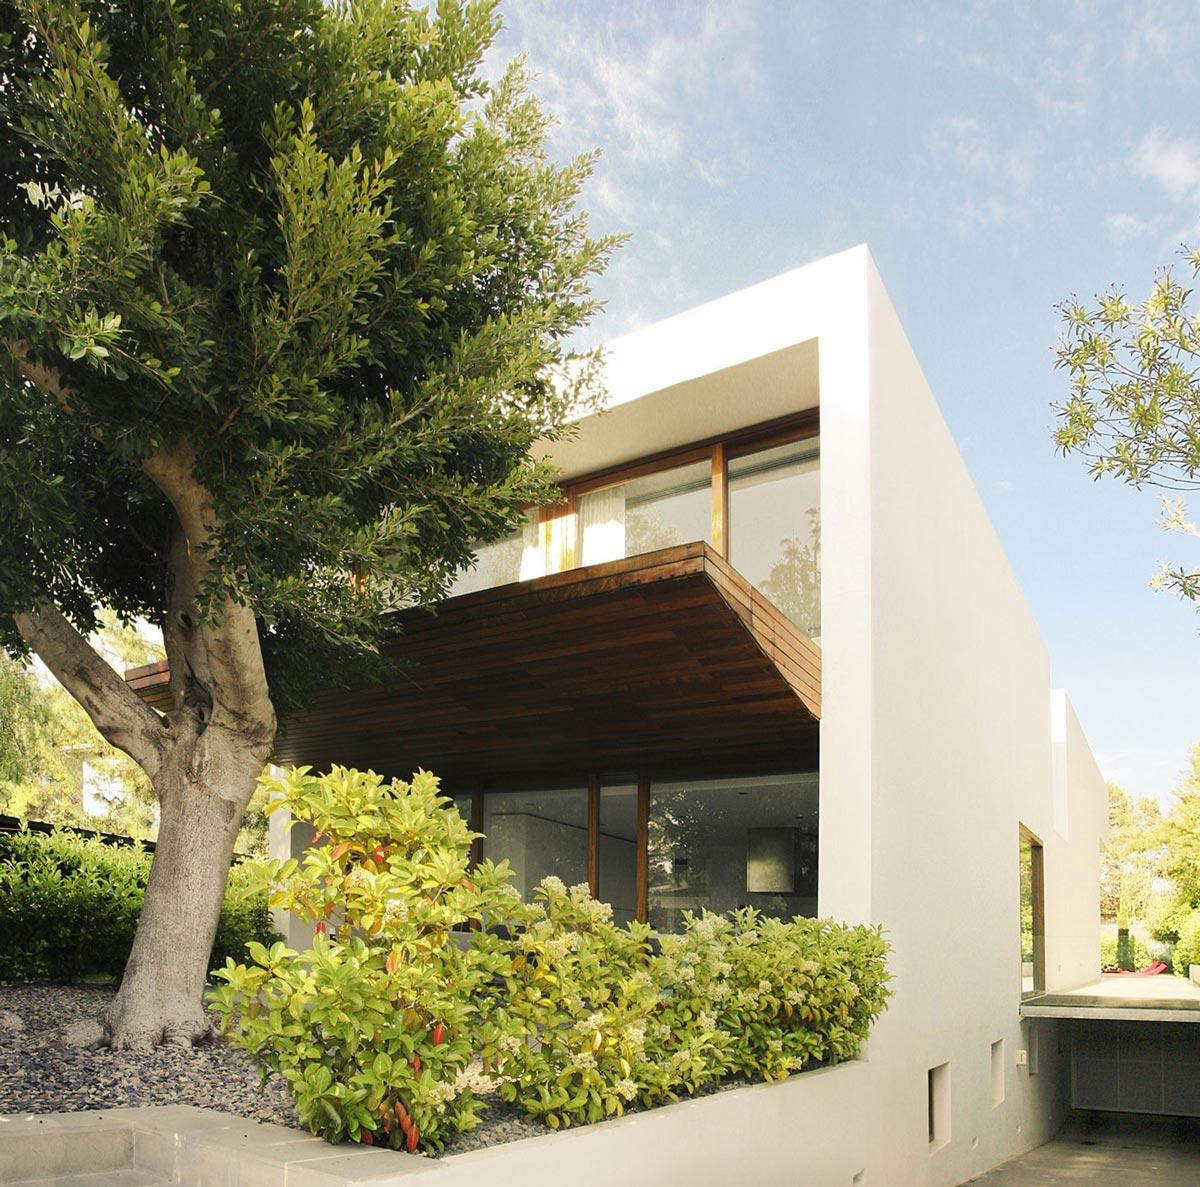 Garage, Contemporary Home in Valencia, Spain